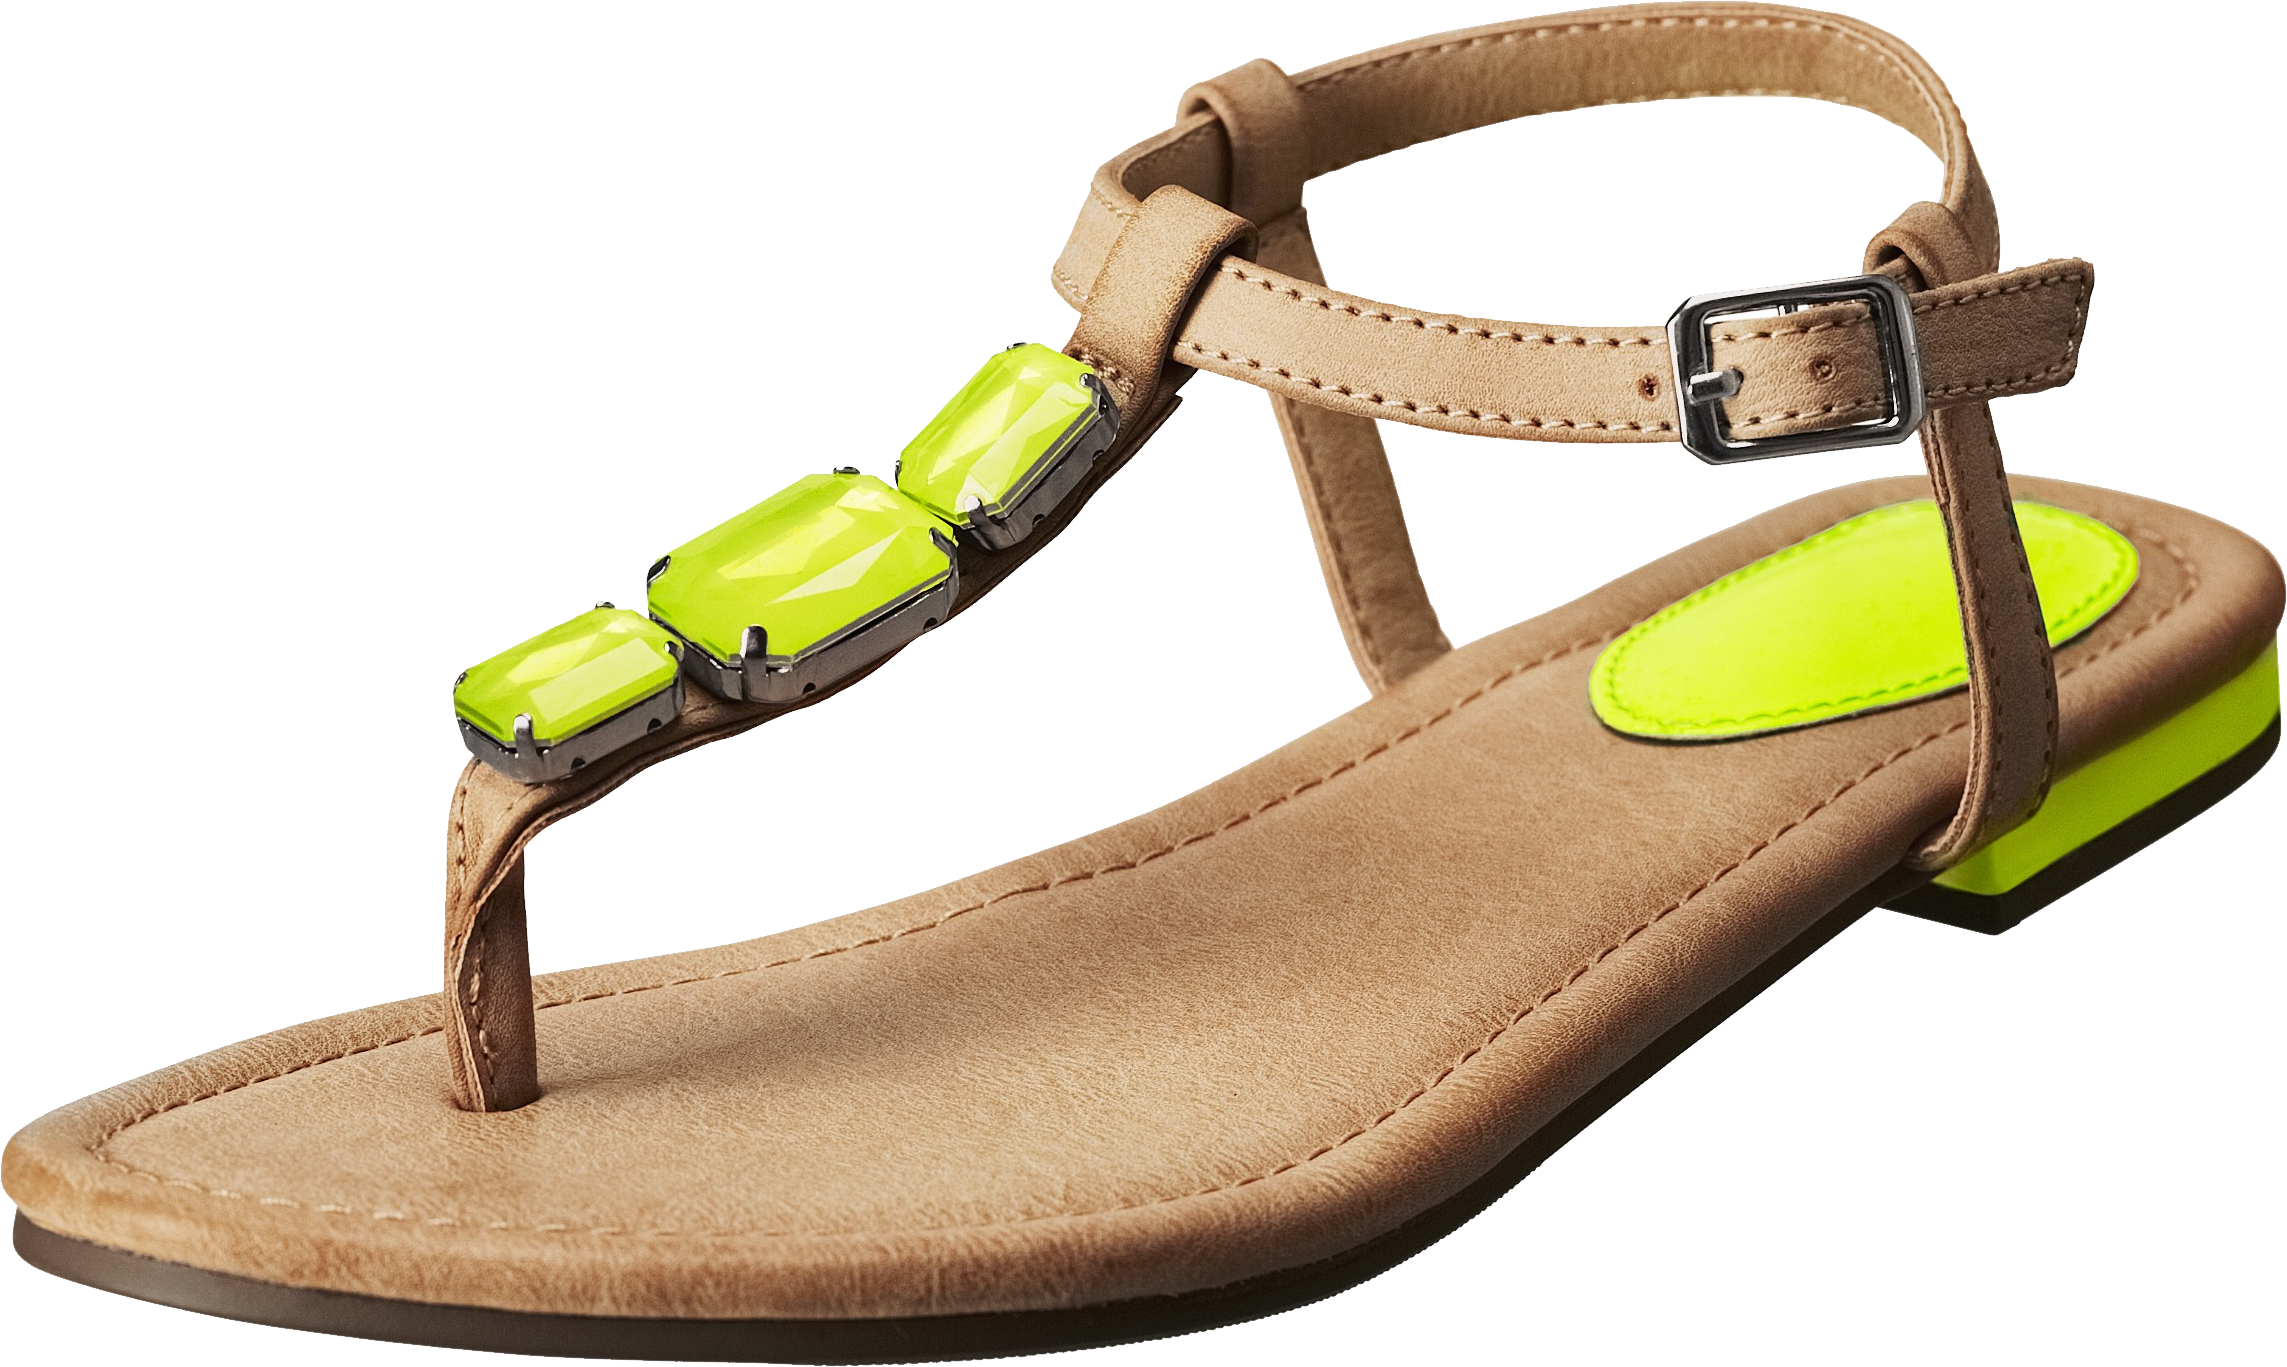 Sandals HD PNG - 118858